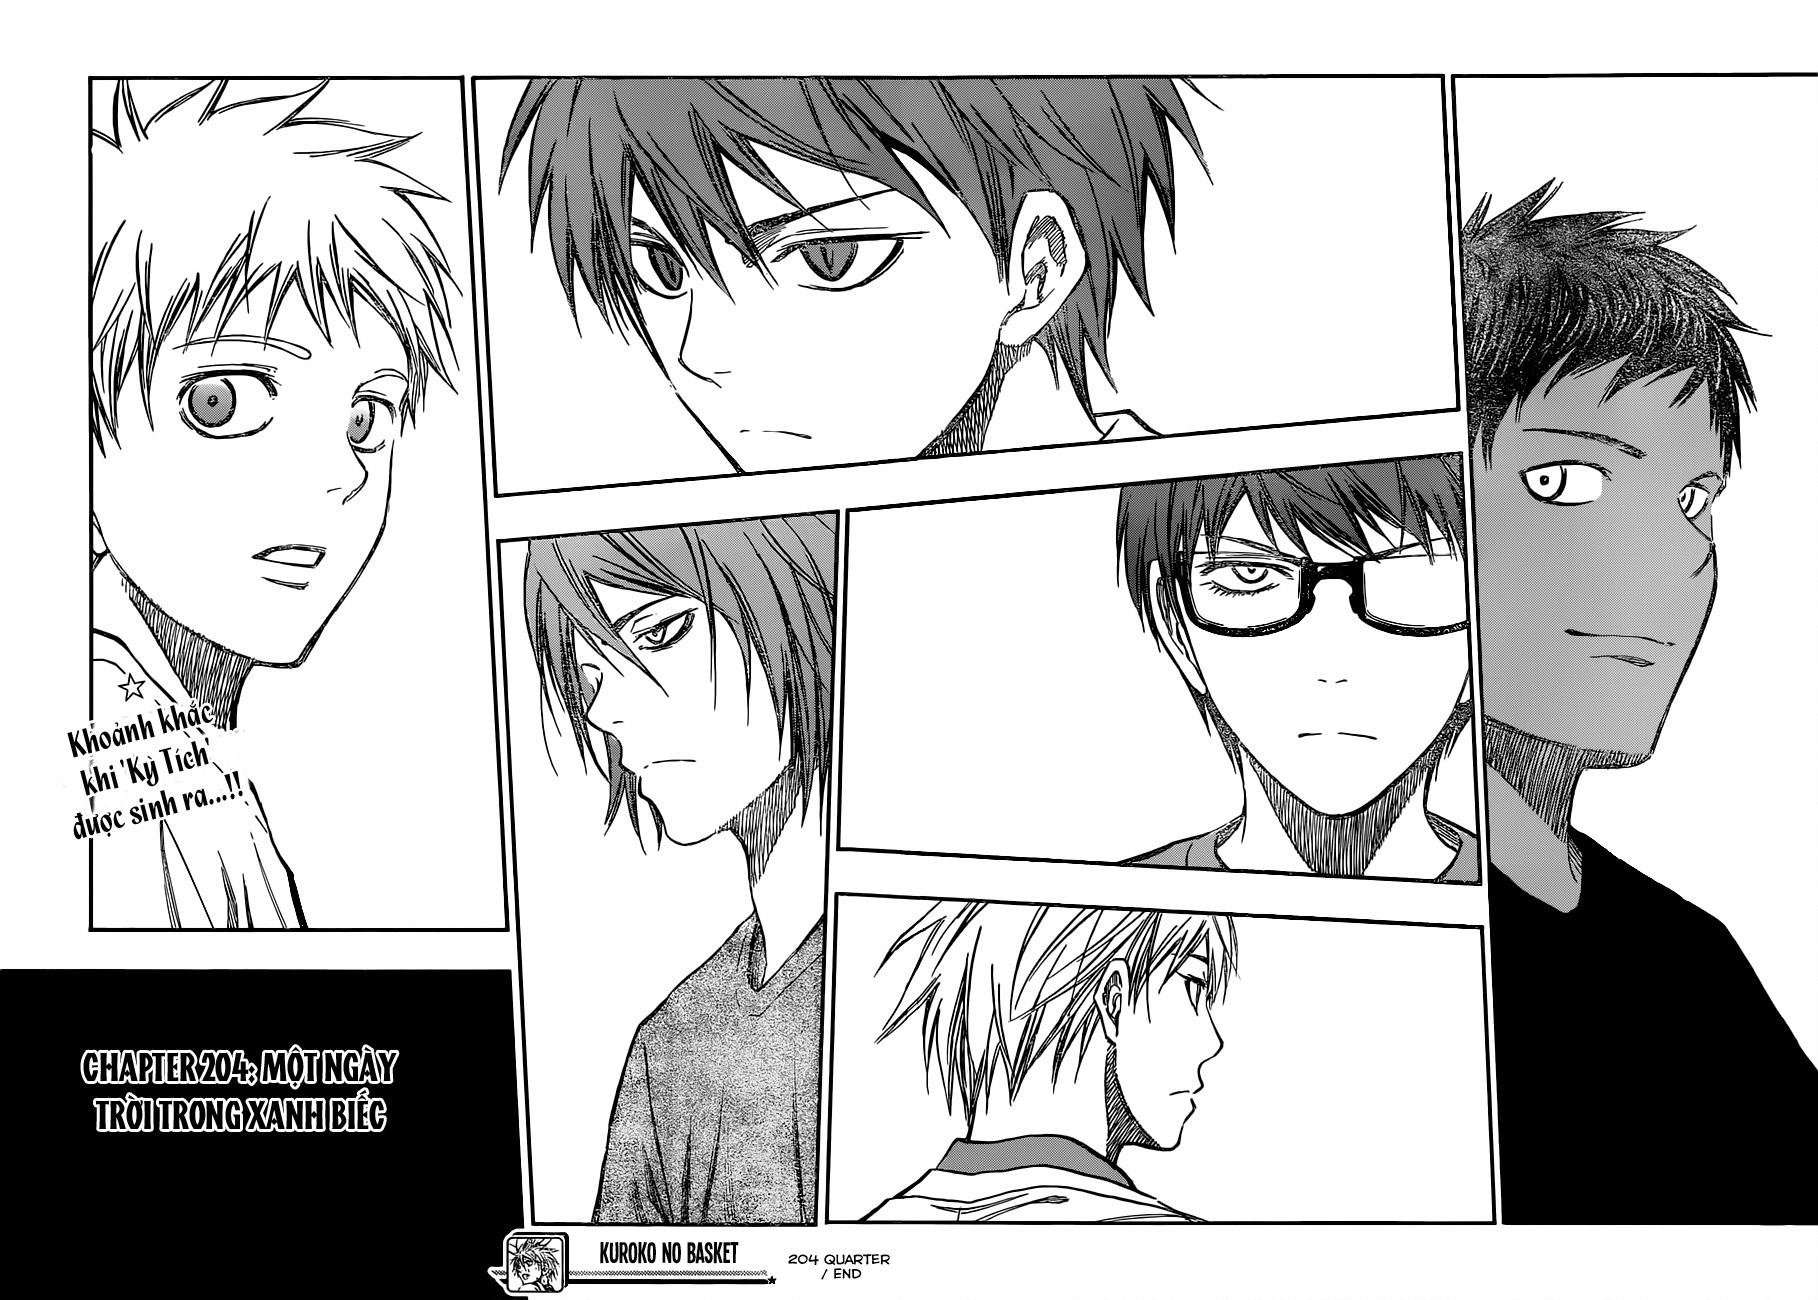 Kuroko No Basket chap 204 trang 19